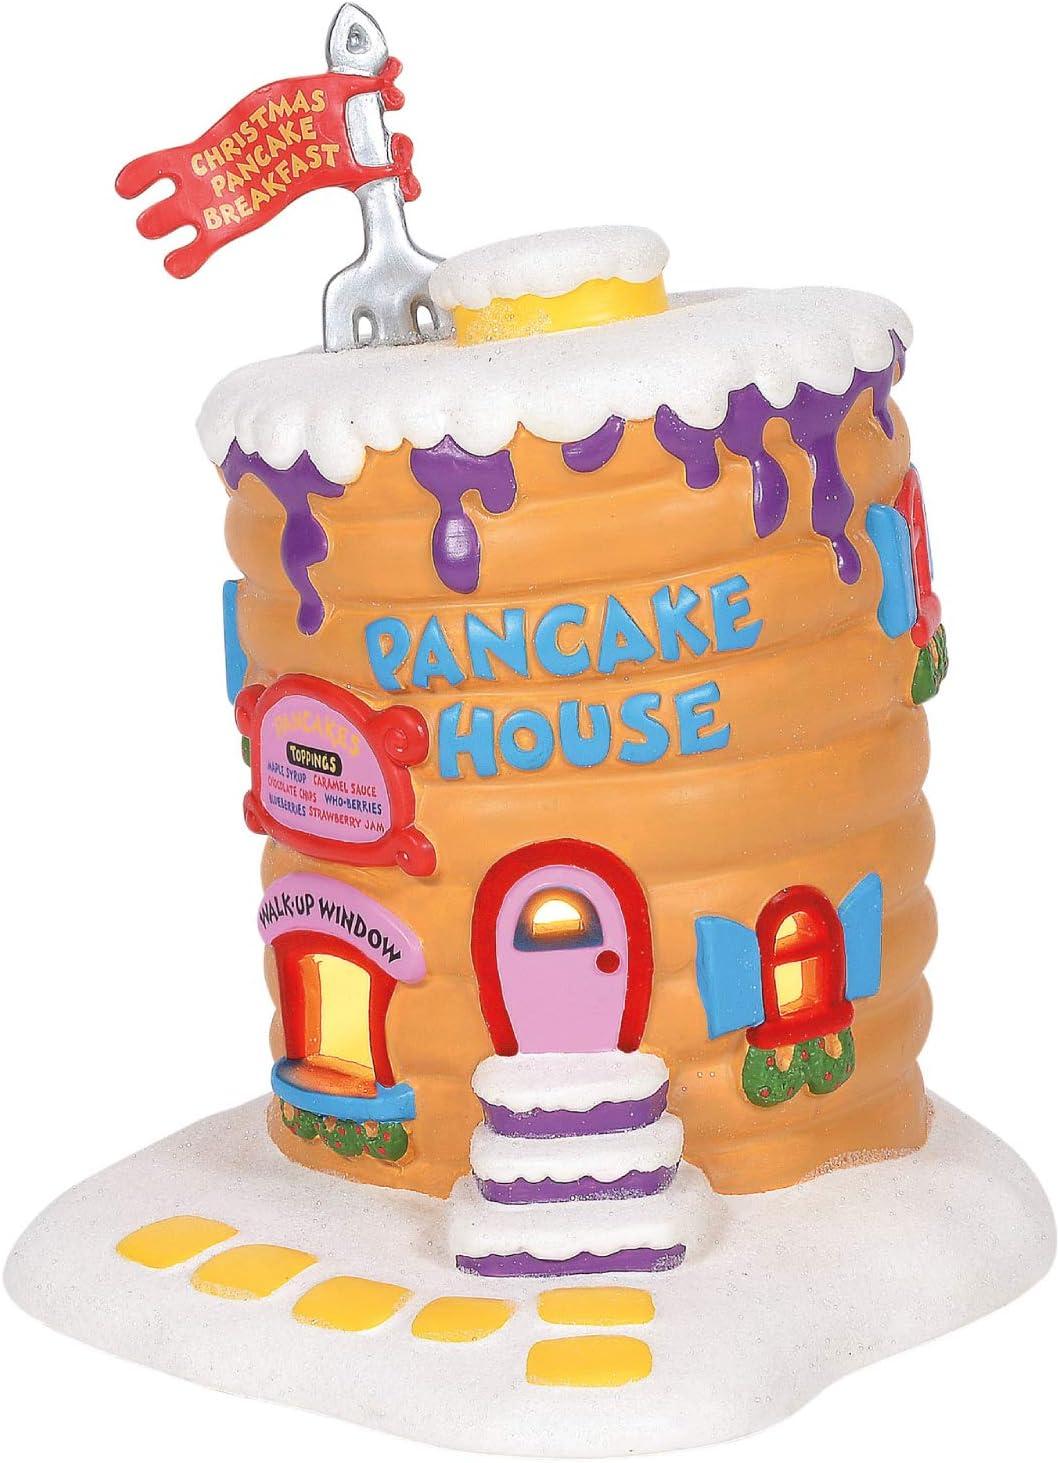 Department 56 Grinch Village Whoville Pancake House Lit Building Multicolor 8.25 Inch